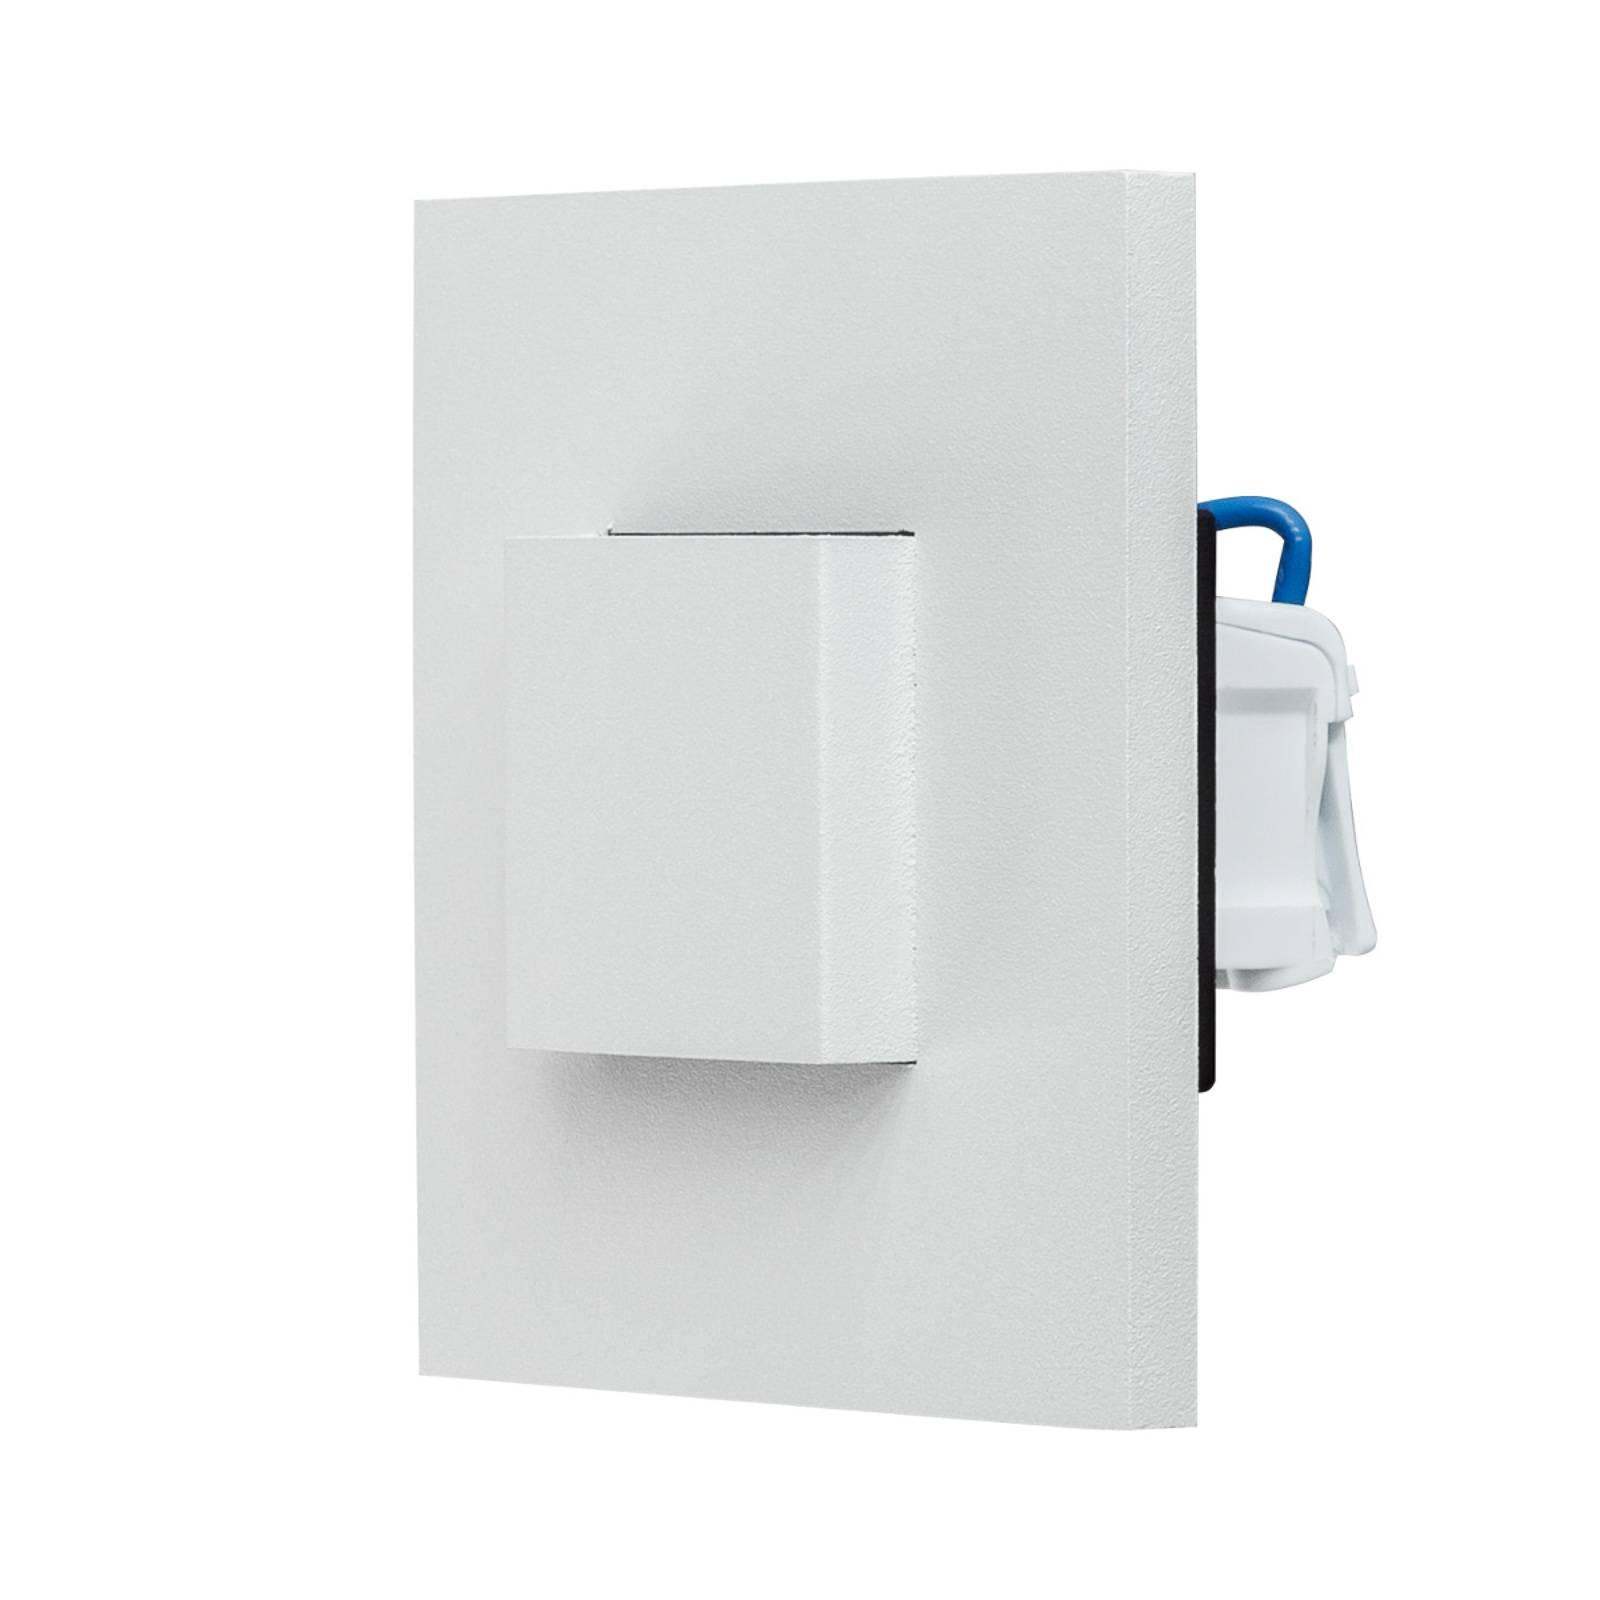 EVN LQ230 LED incasso parete up/down bianco